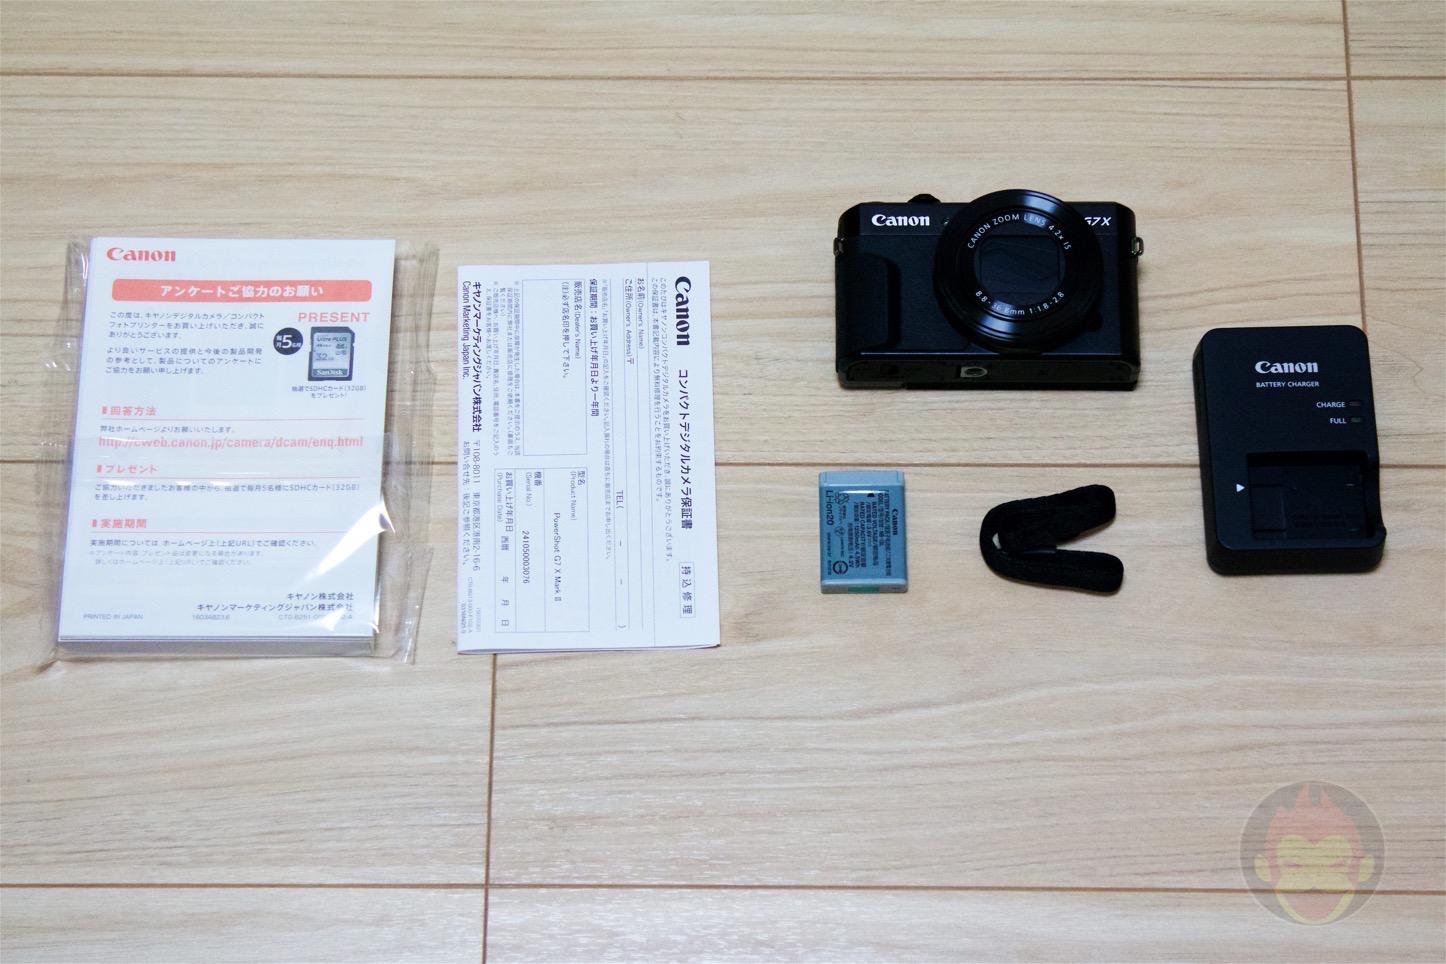 Canon PowerShot G7 Mark2